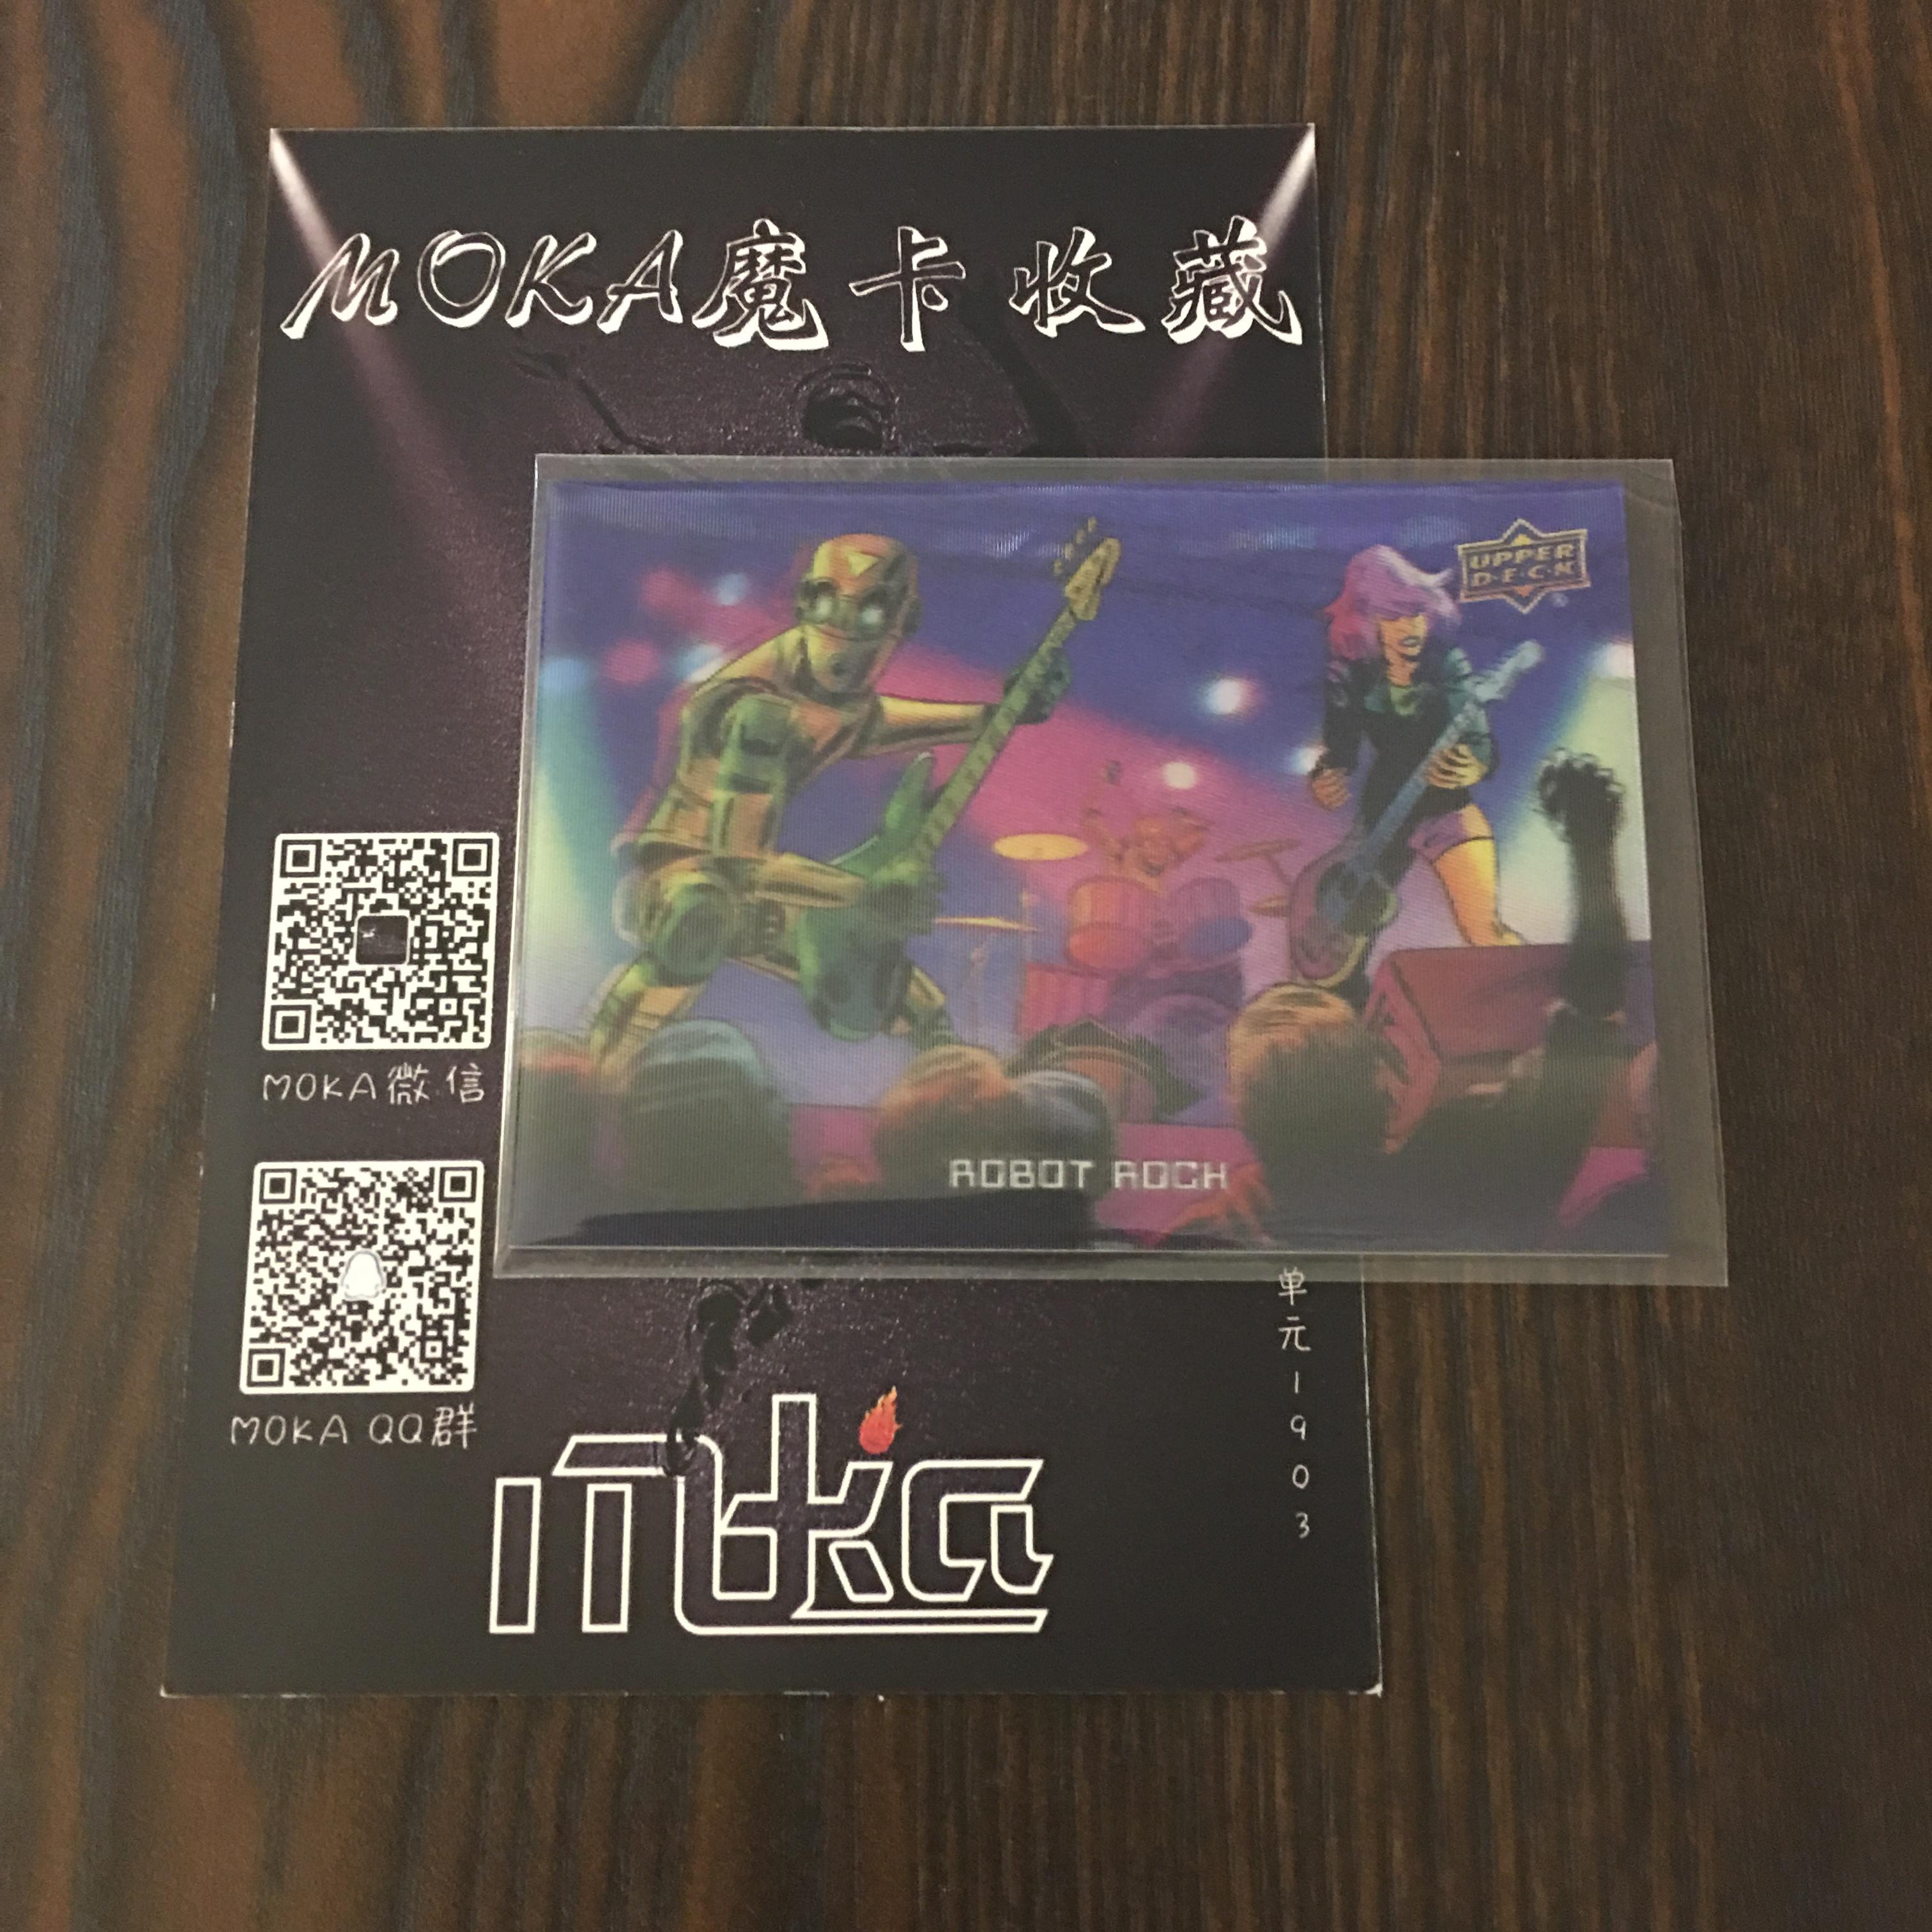 【MOKA球星卡收藏】#1804457 2018 UD Goodwin 古德温 3D特卡 编号 R-11 凑套必备